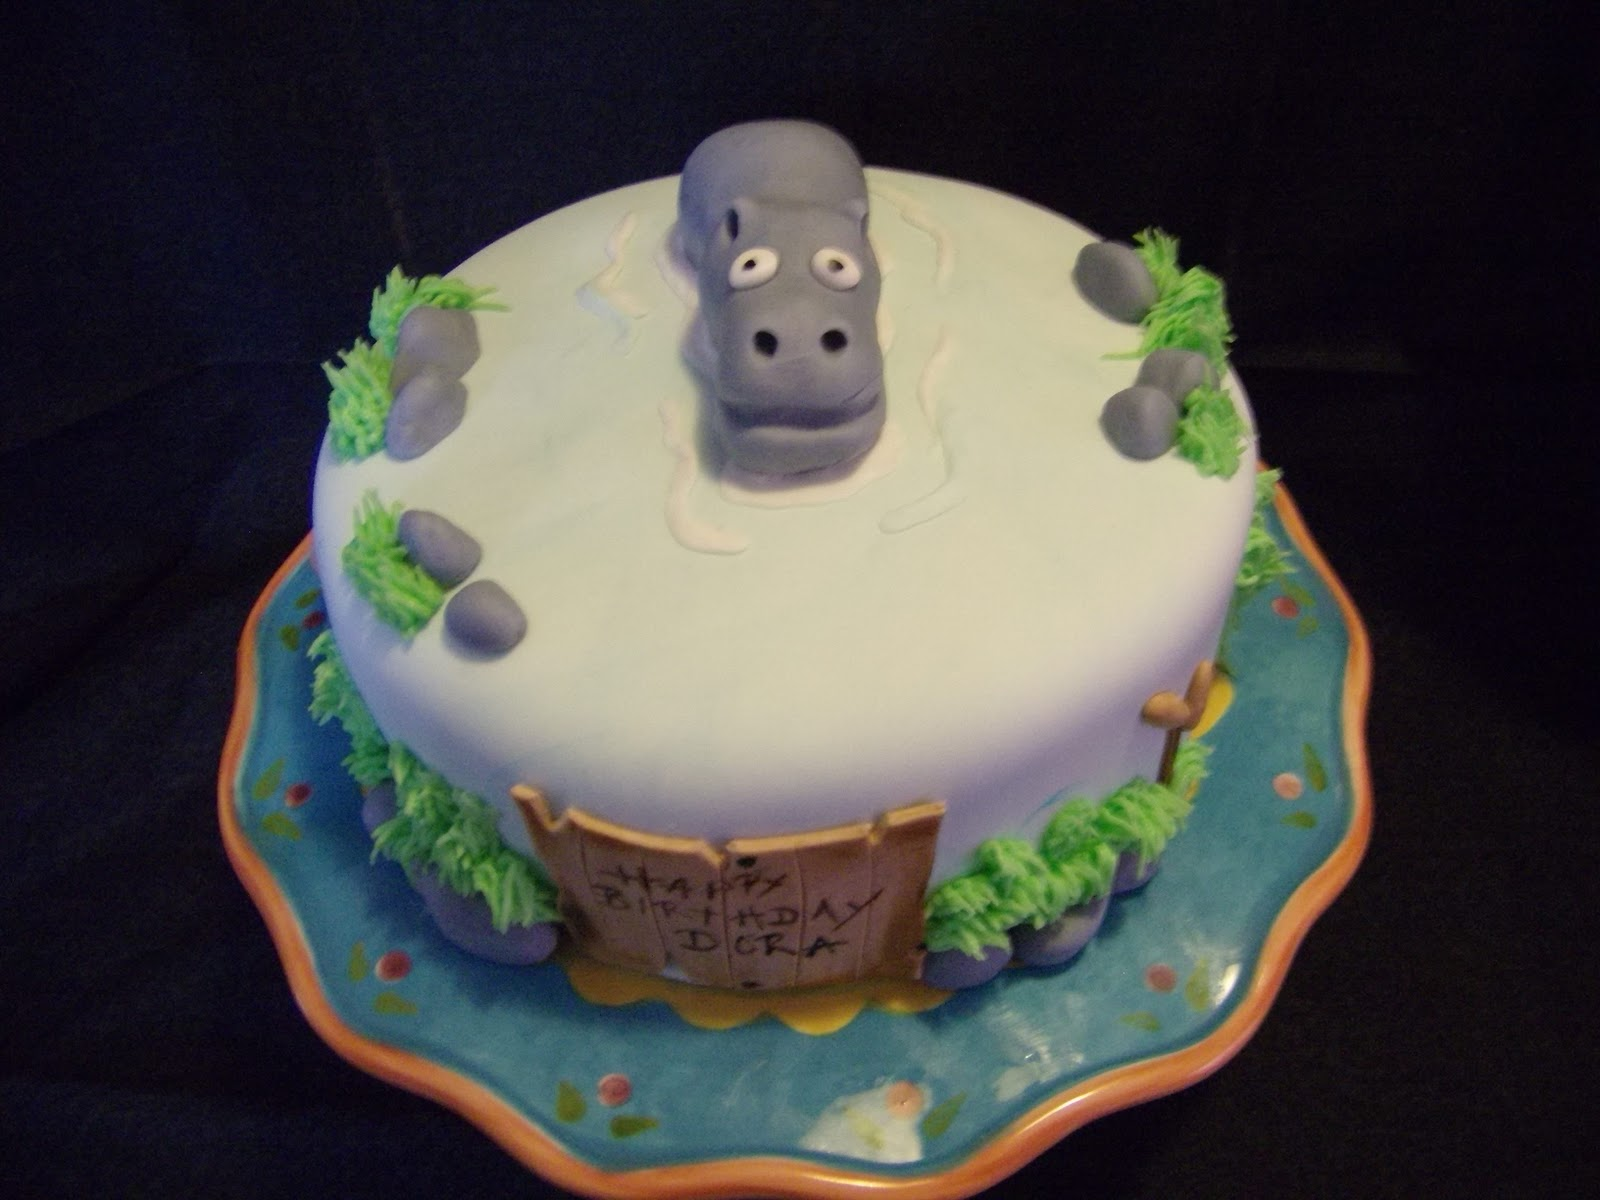 350 Degree Confections Hiphopopotamus Vs Rhymenoceros